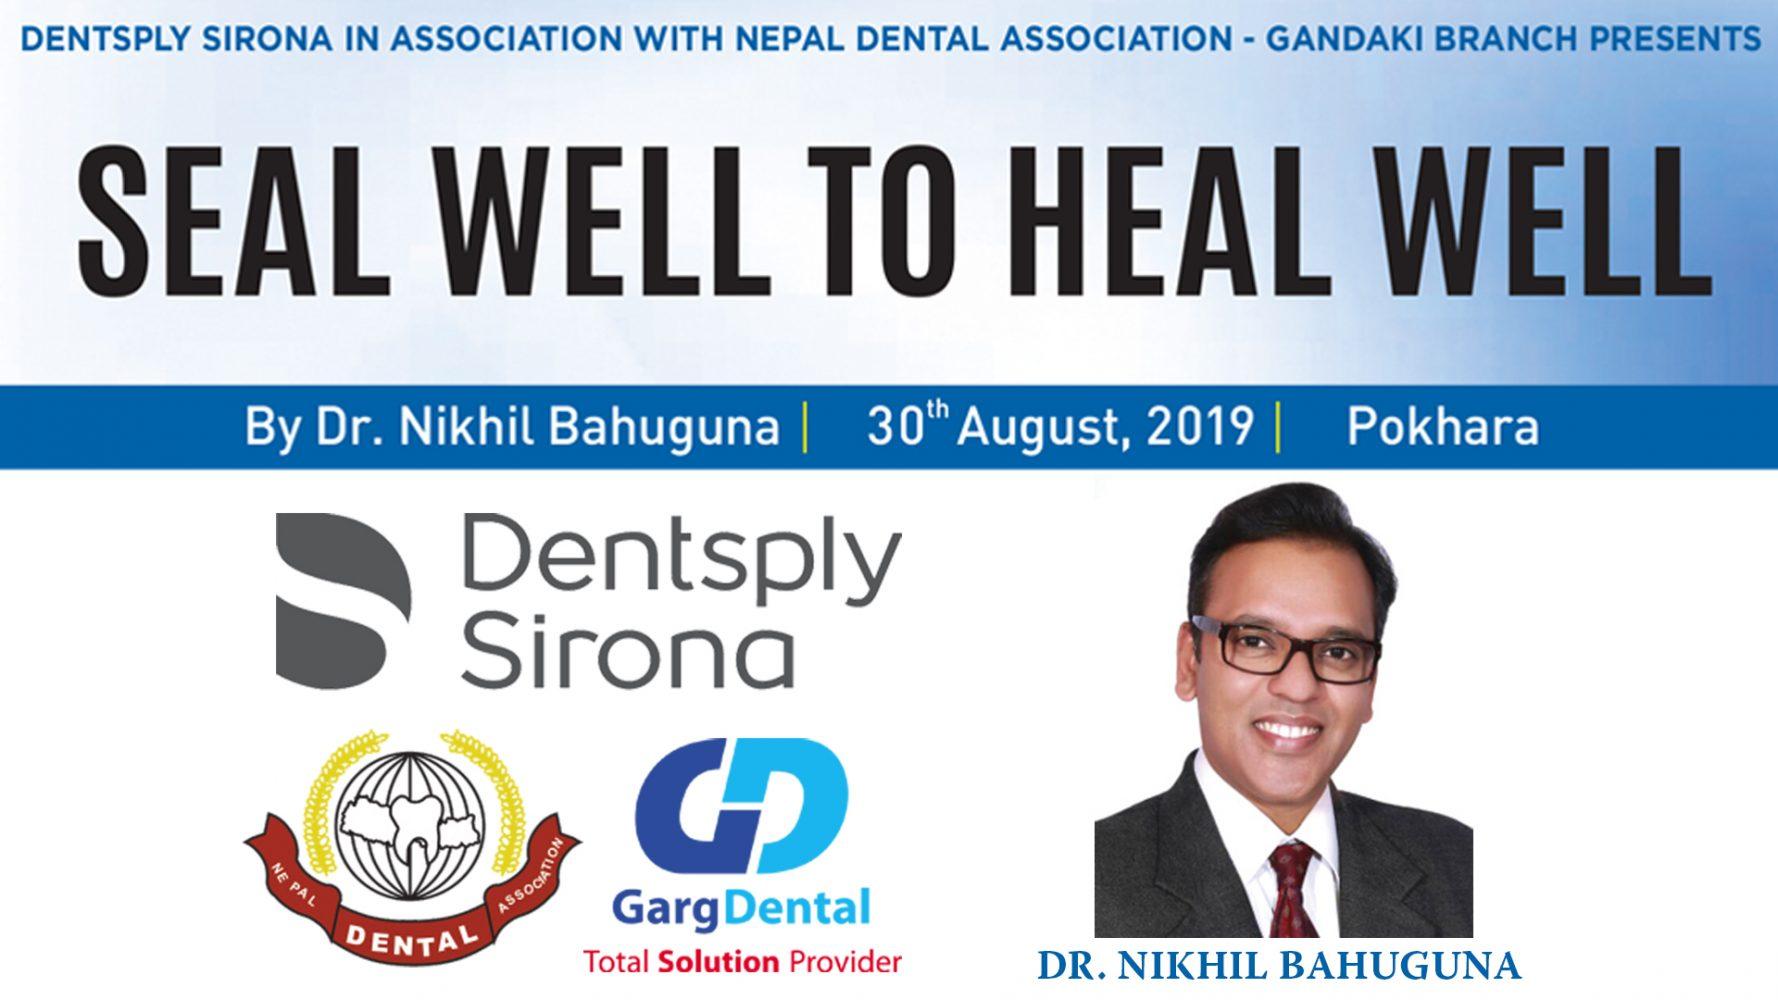 Seal Well to Heal Well – Dr. Nikhil Bahuguna – 30th Aug 2019 – Pokhara